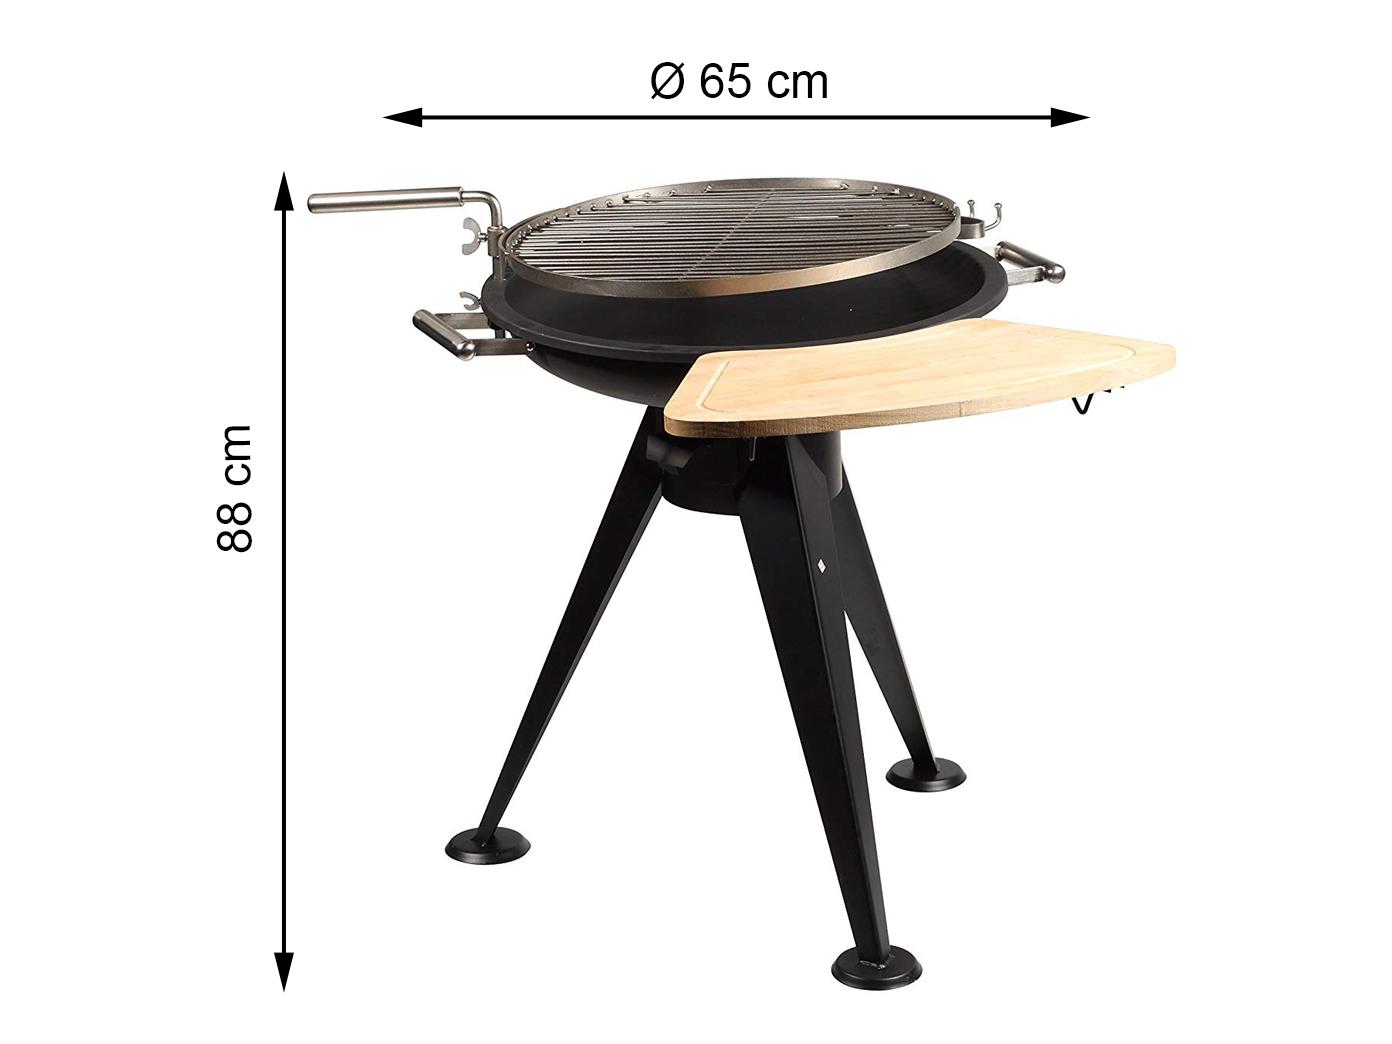 Rauchfreier Holzkohlegrill Im Test : Grill kaufen test vergleich grill kaufen günstig kaufen